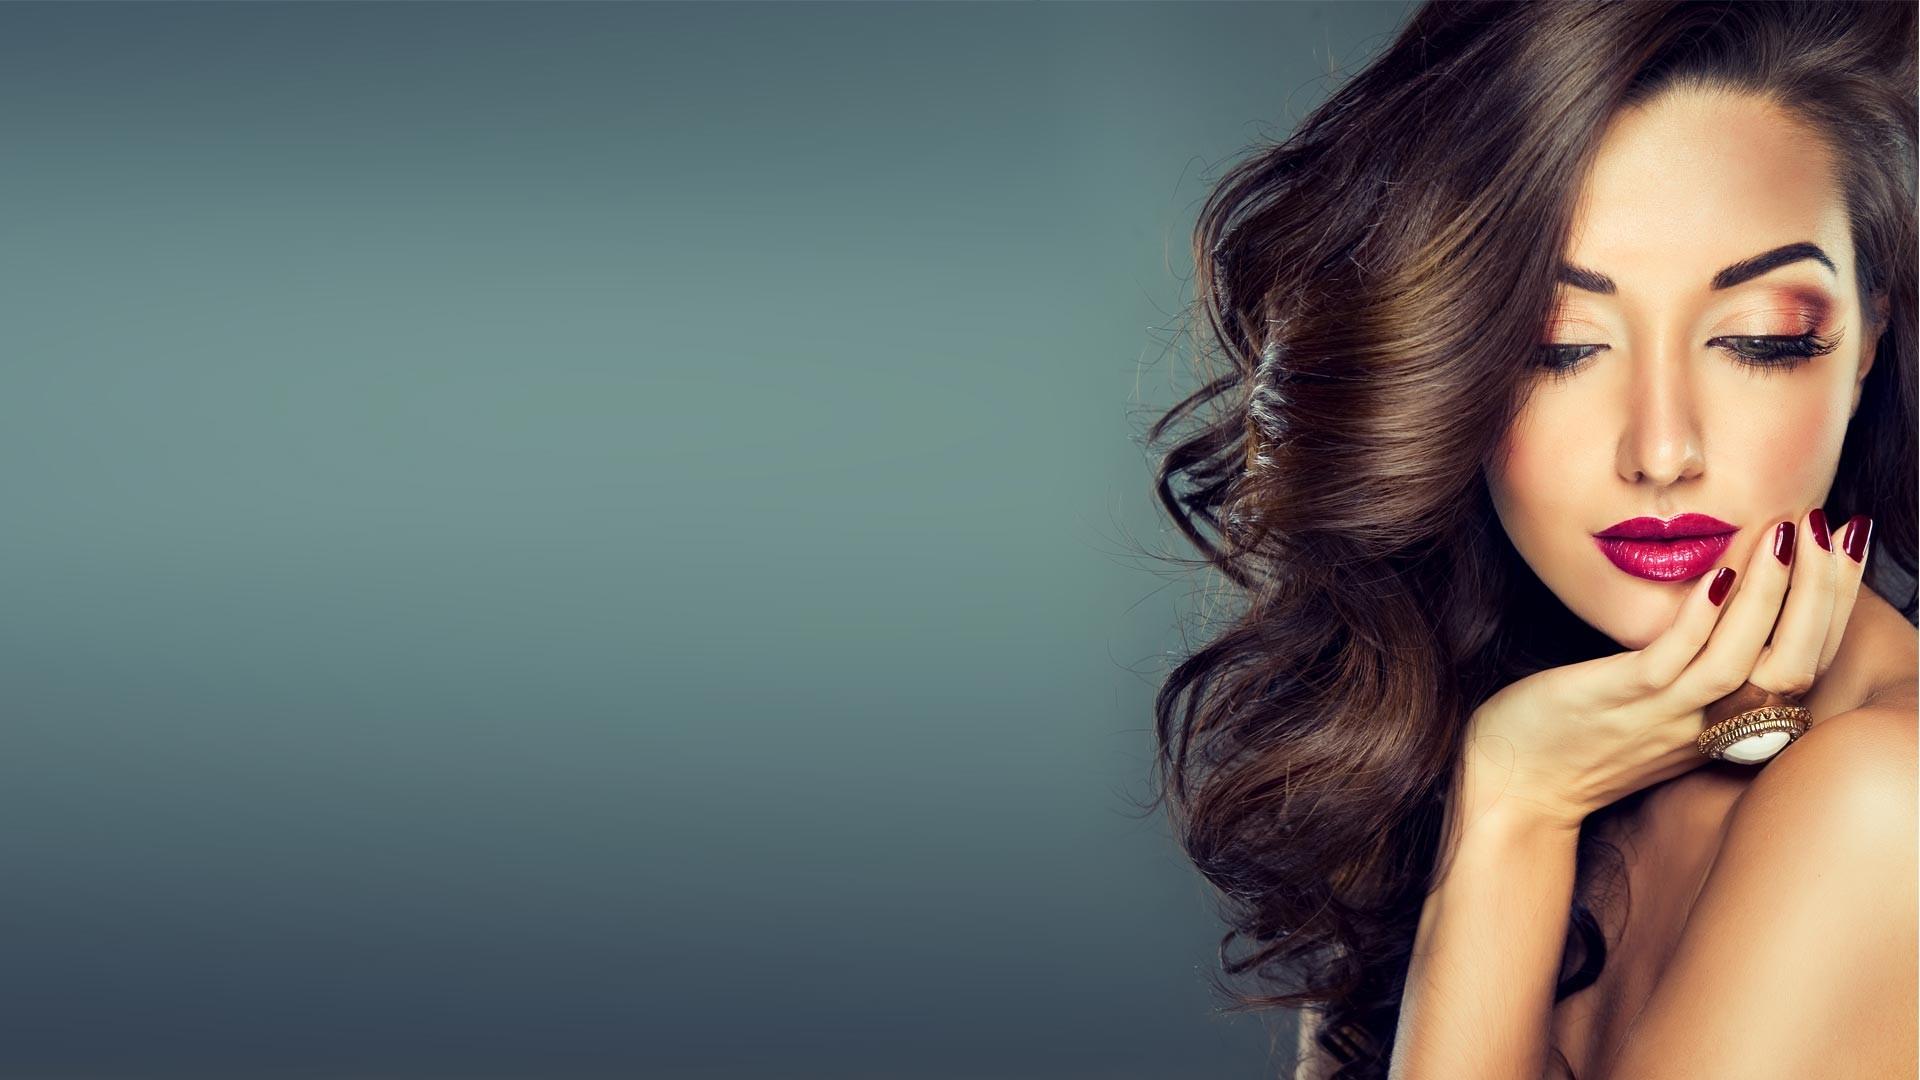 31 Beauty Salon